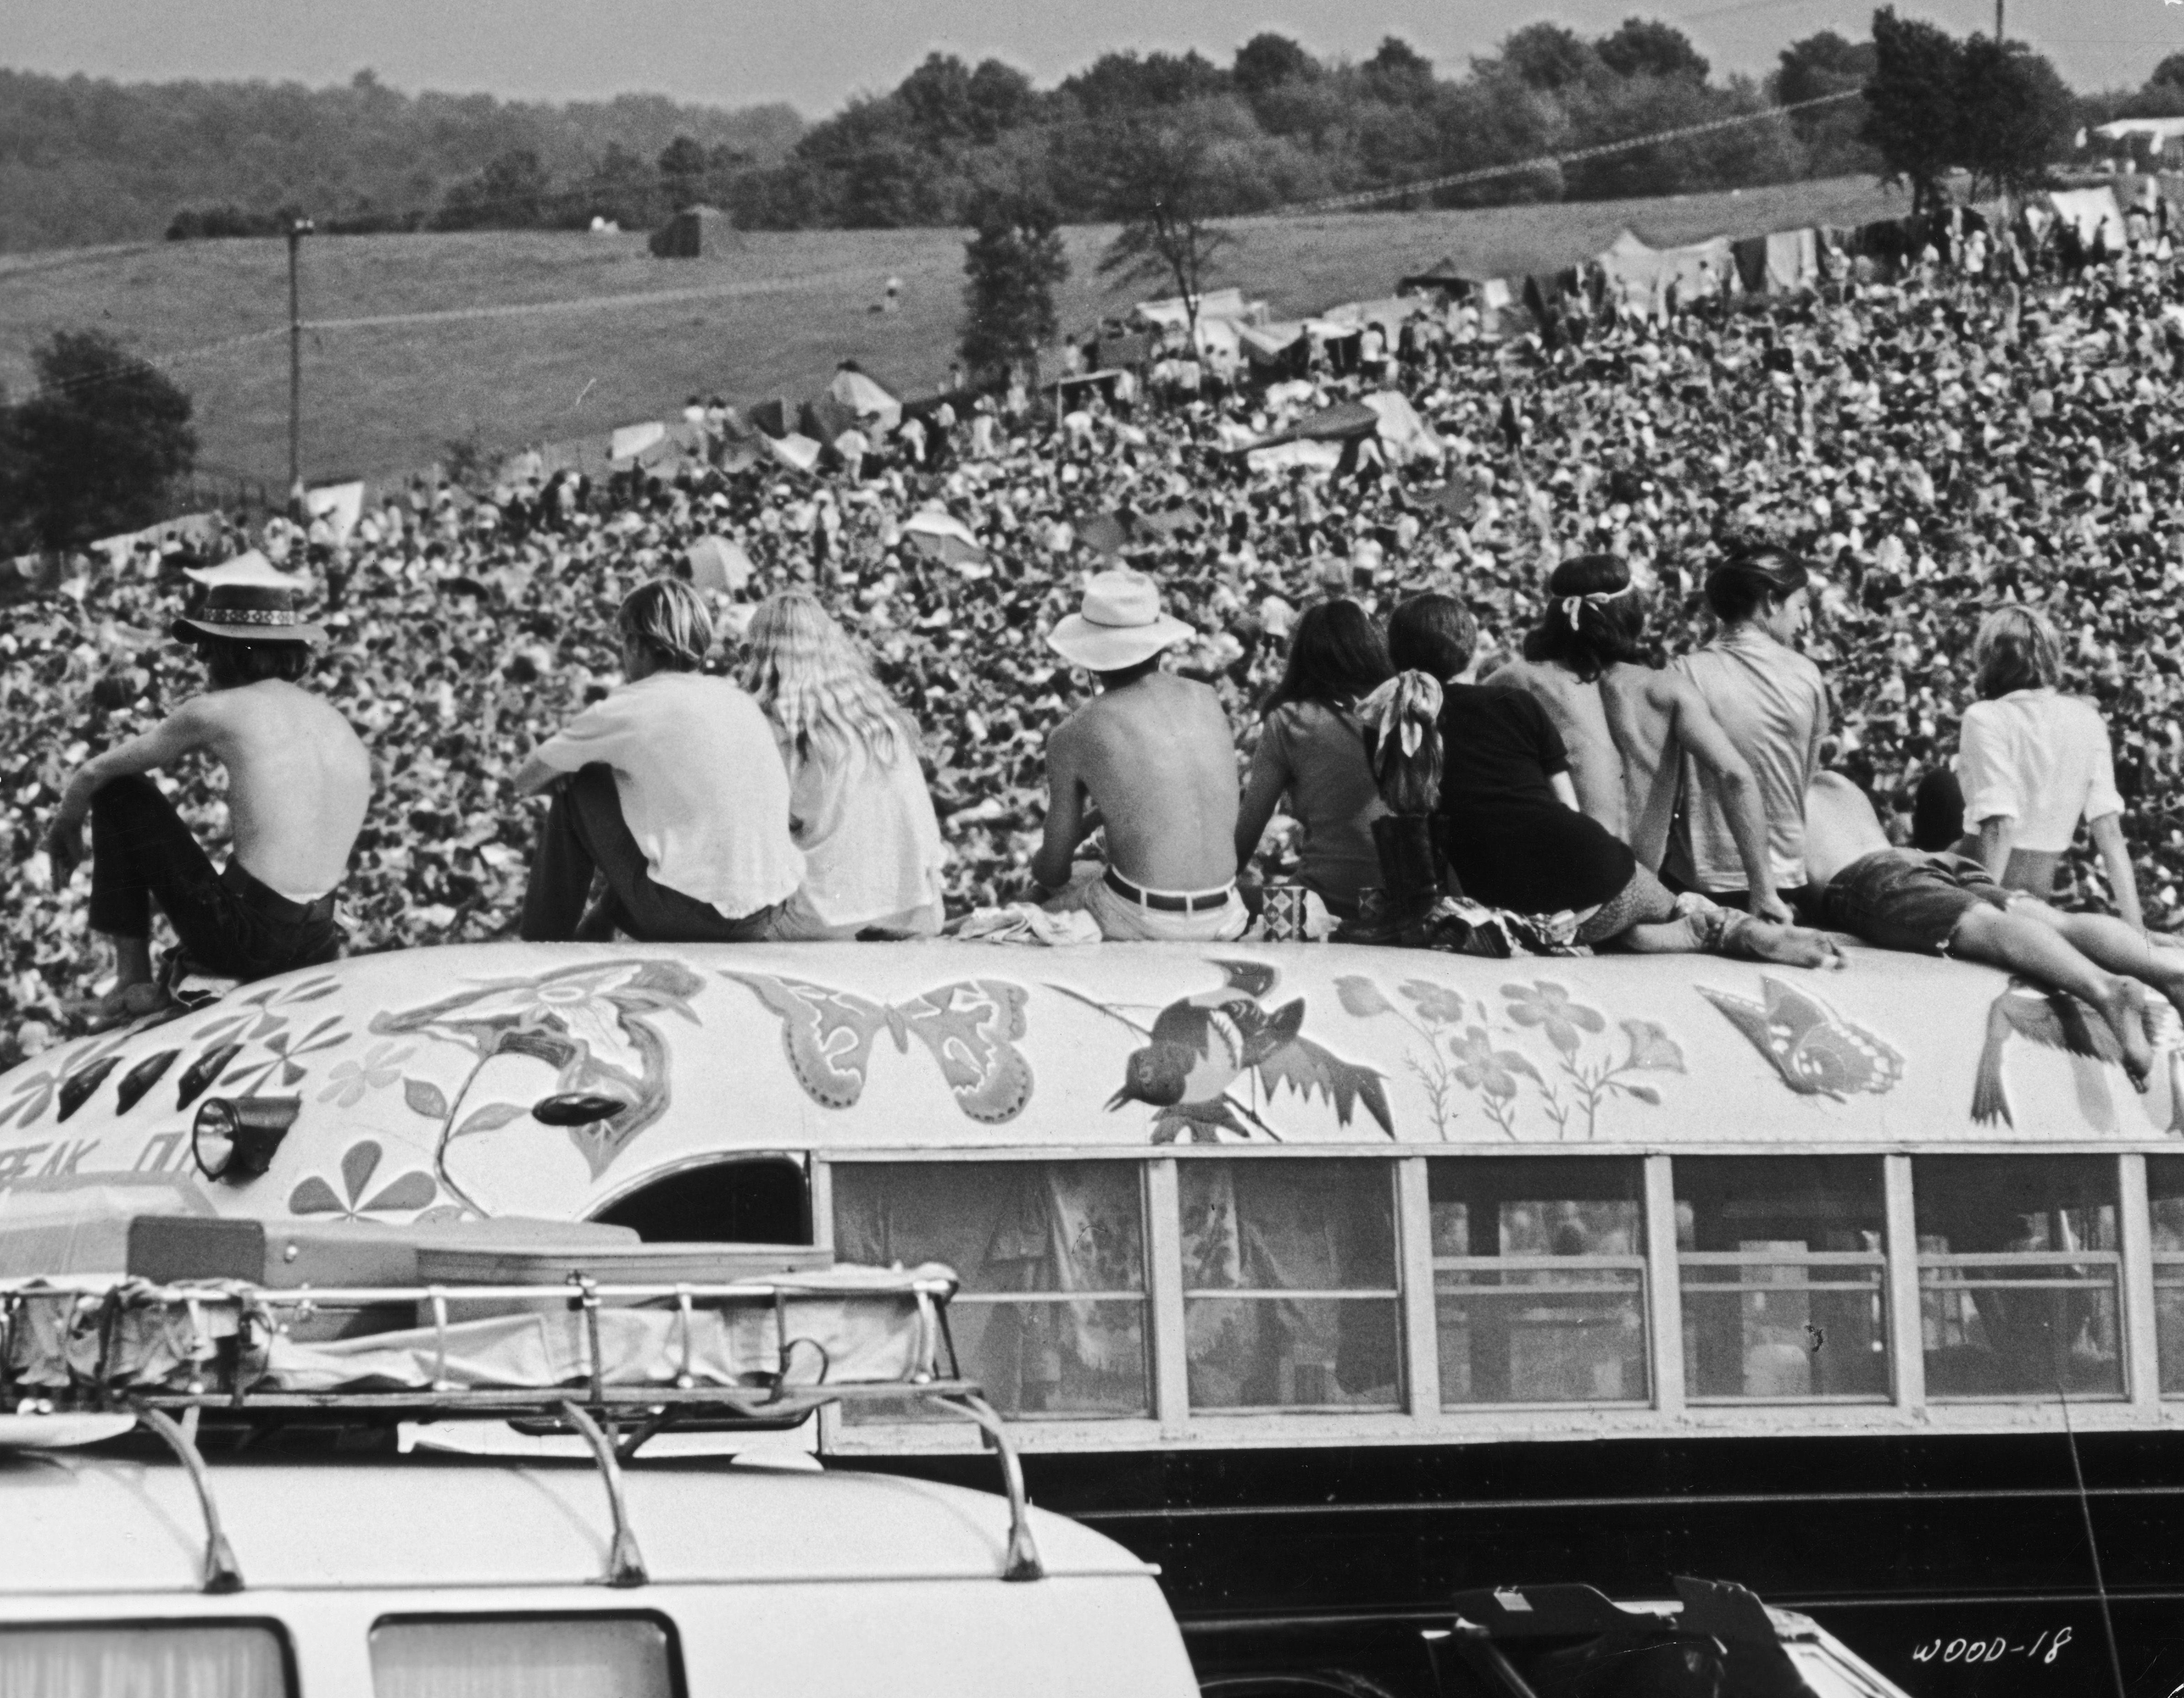 How Festival Technology Has Evolved Since Woodstock